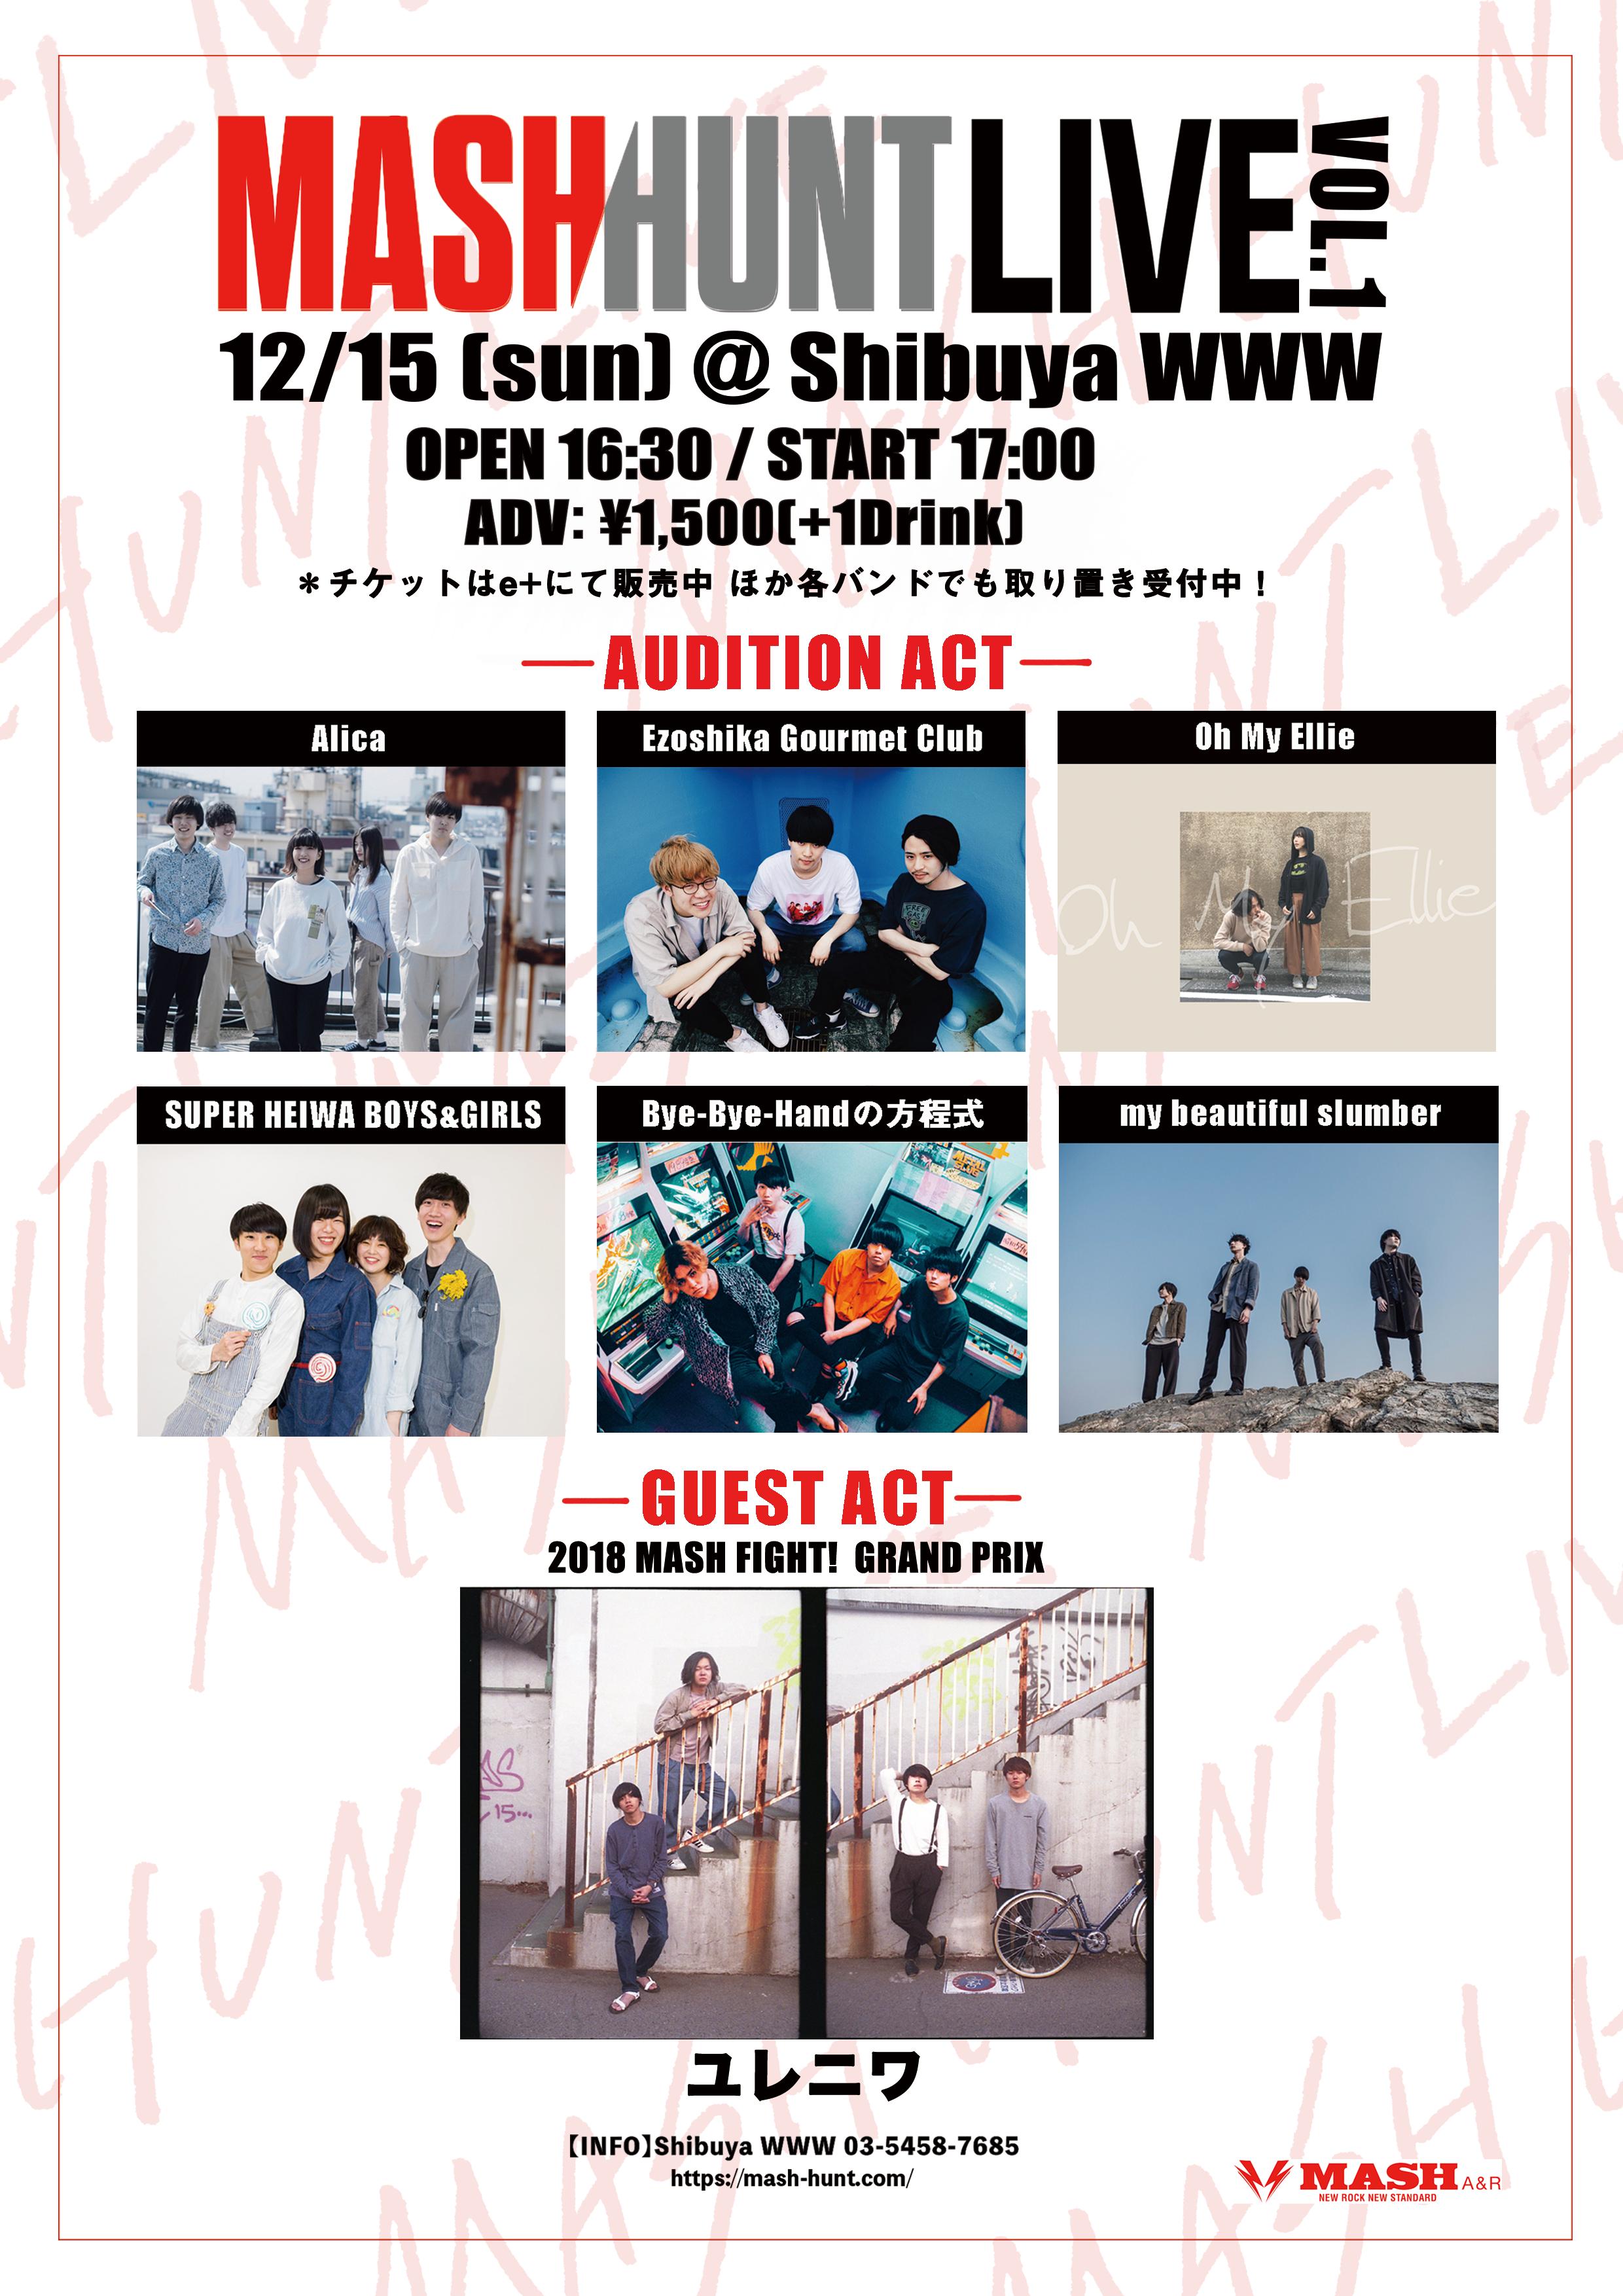 AUDITION ACT:SUPER HEIWA BOYS&GIRLS / Bye-Bye-Handの方程式 / my beautiful Slumber /Ezoshika Gourmet Club / Alica / Oh My Ellie / GUEST ACT:ユレニワ